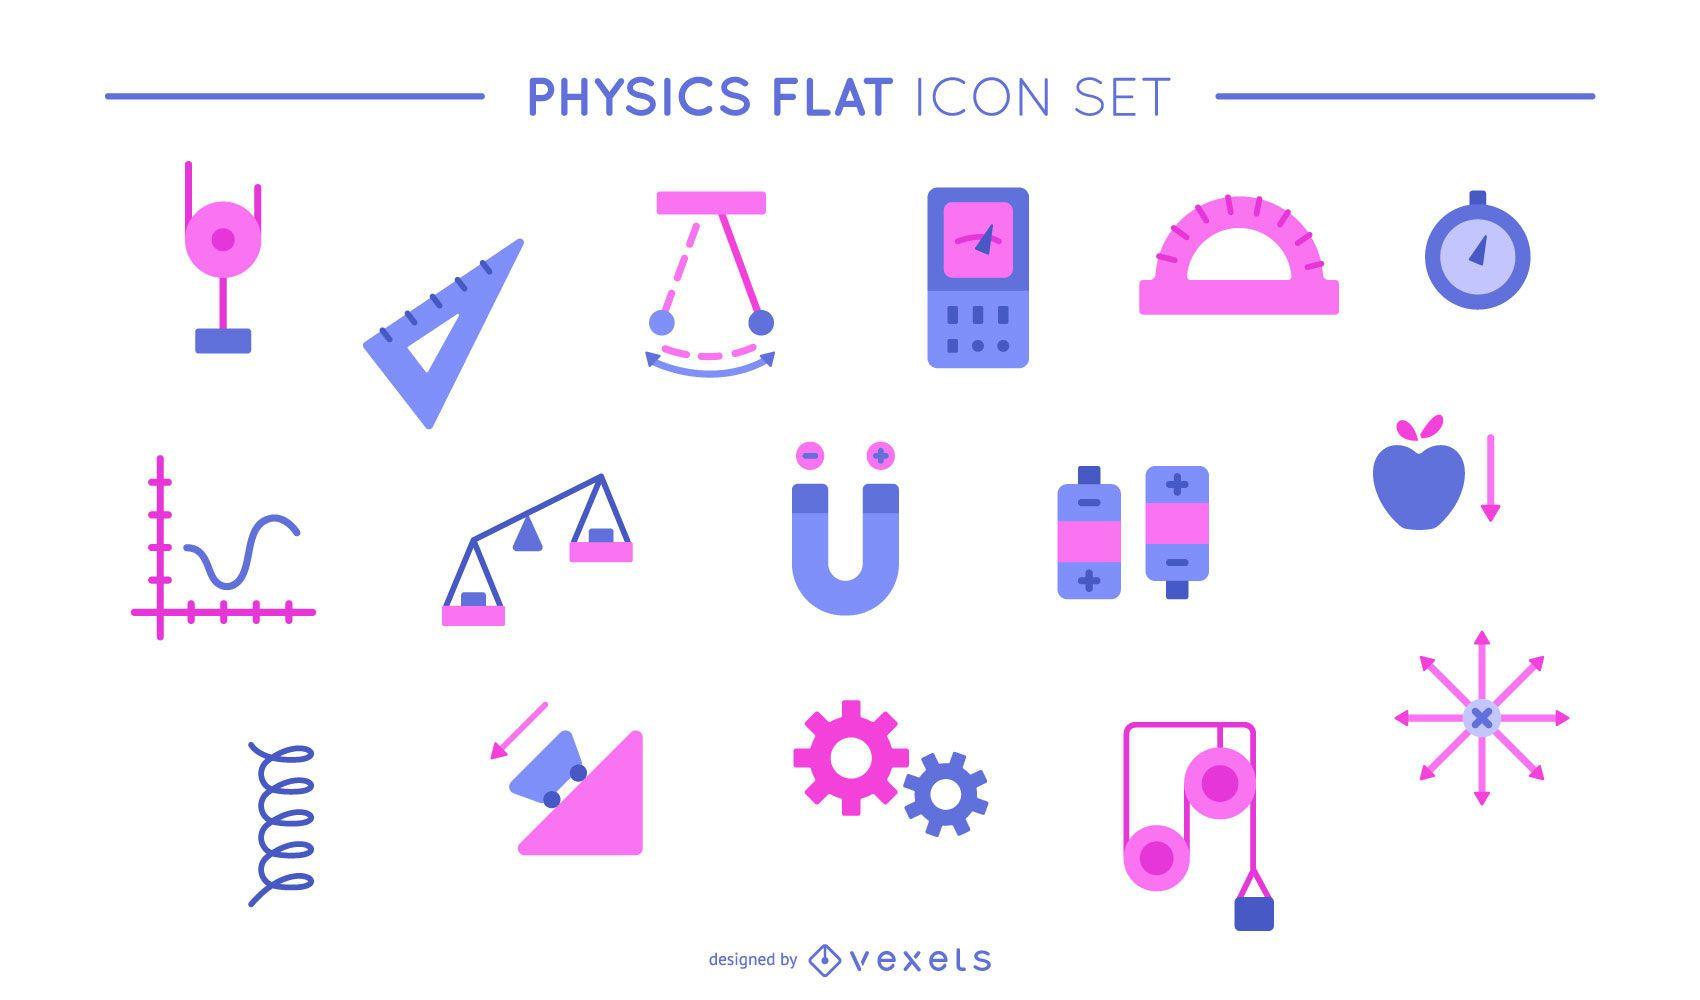 Physics flat icon set